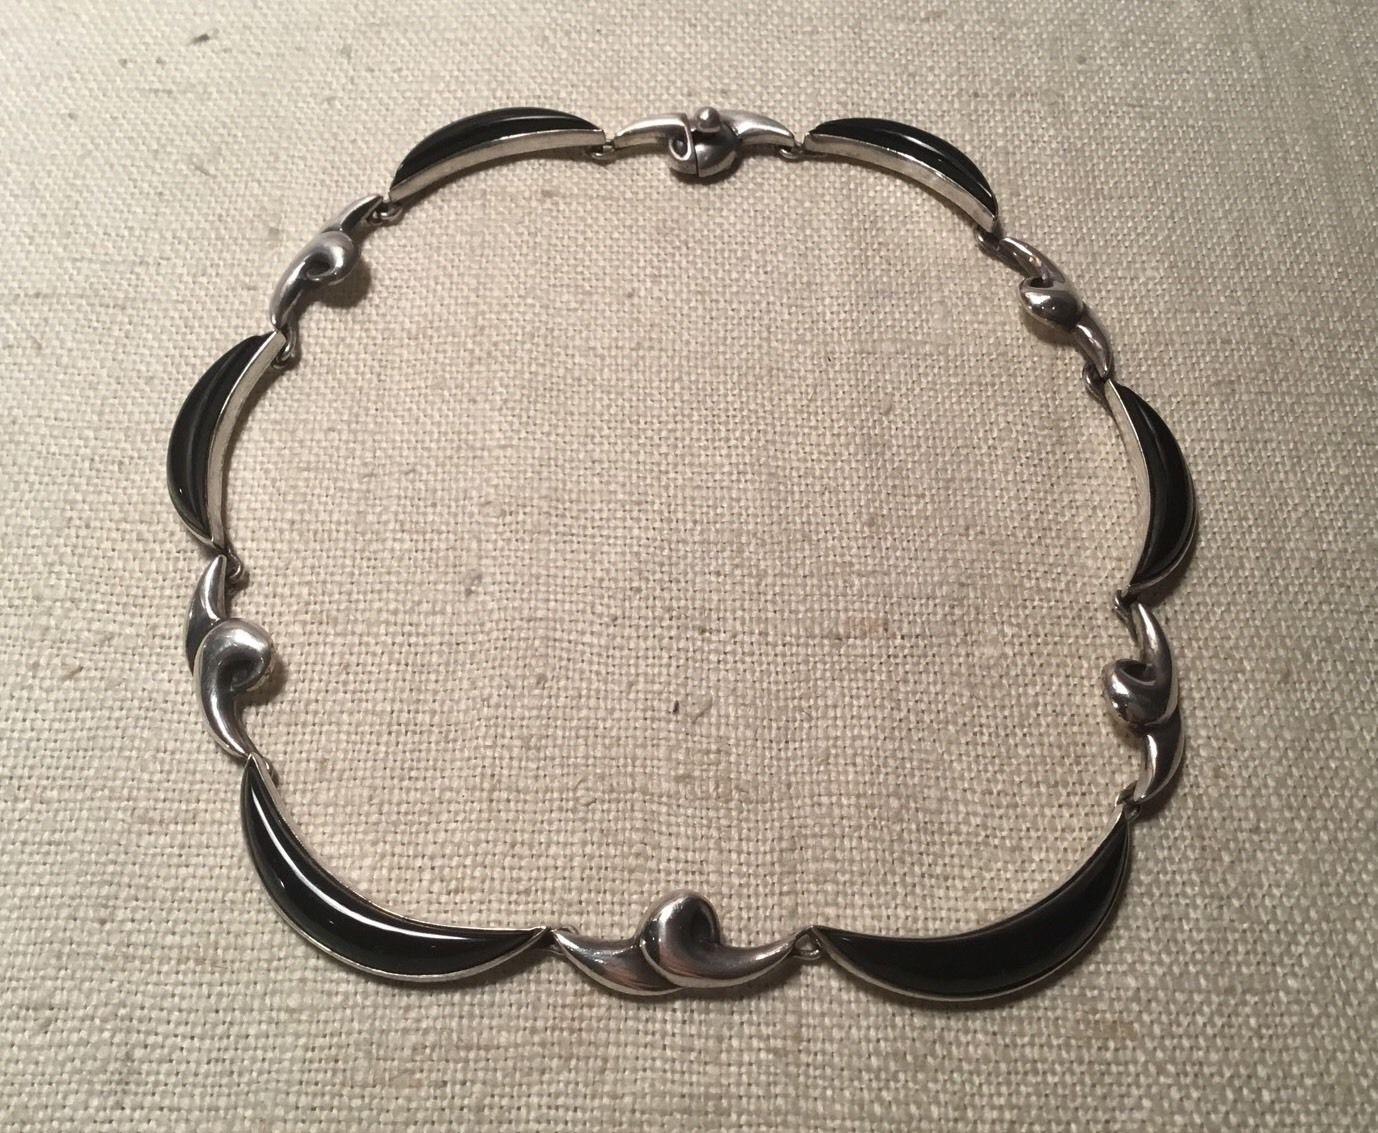 Mexican Silver - Antonio Pineda - Green Heart Pendant